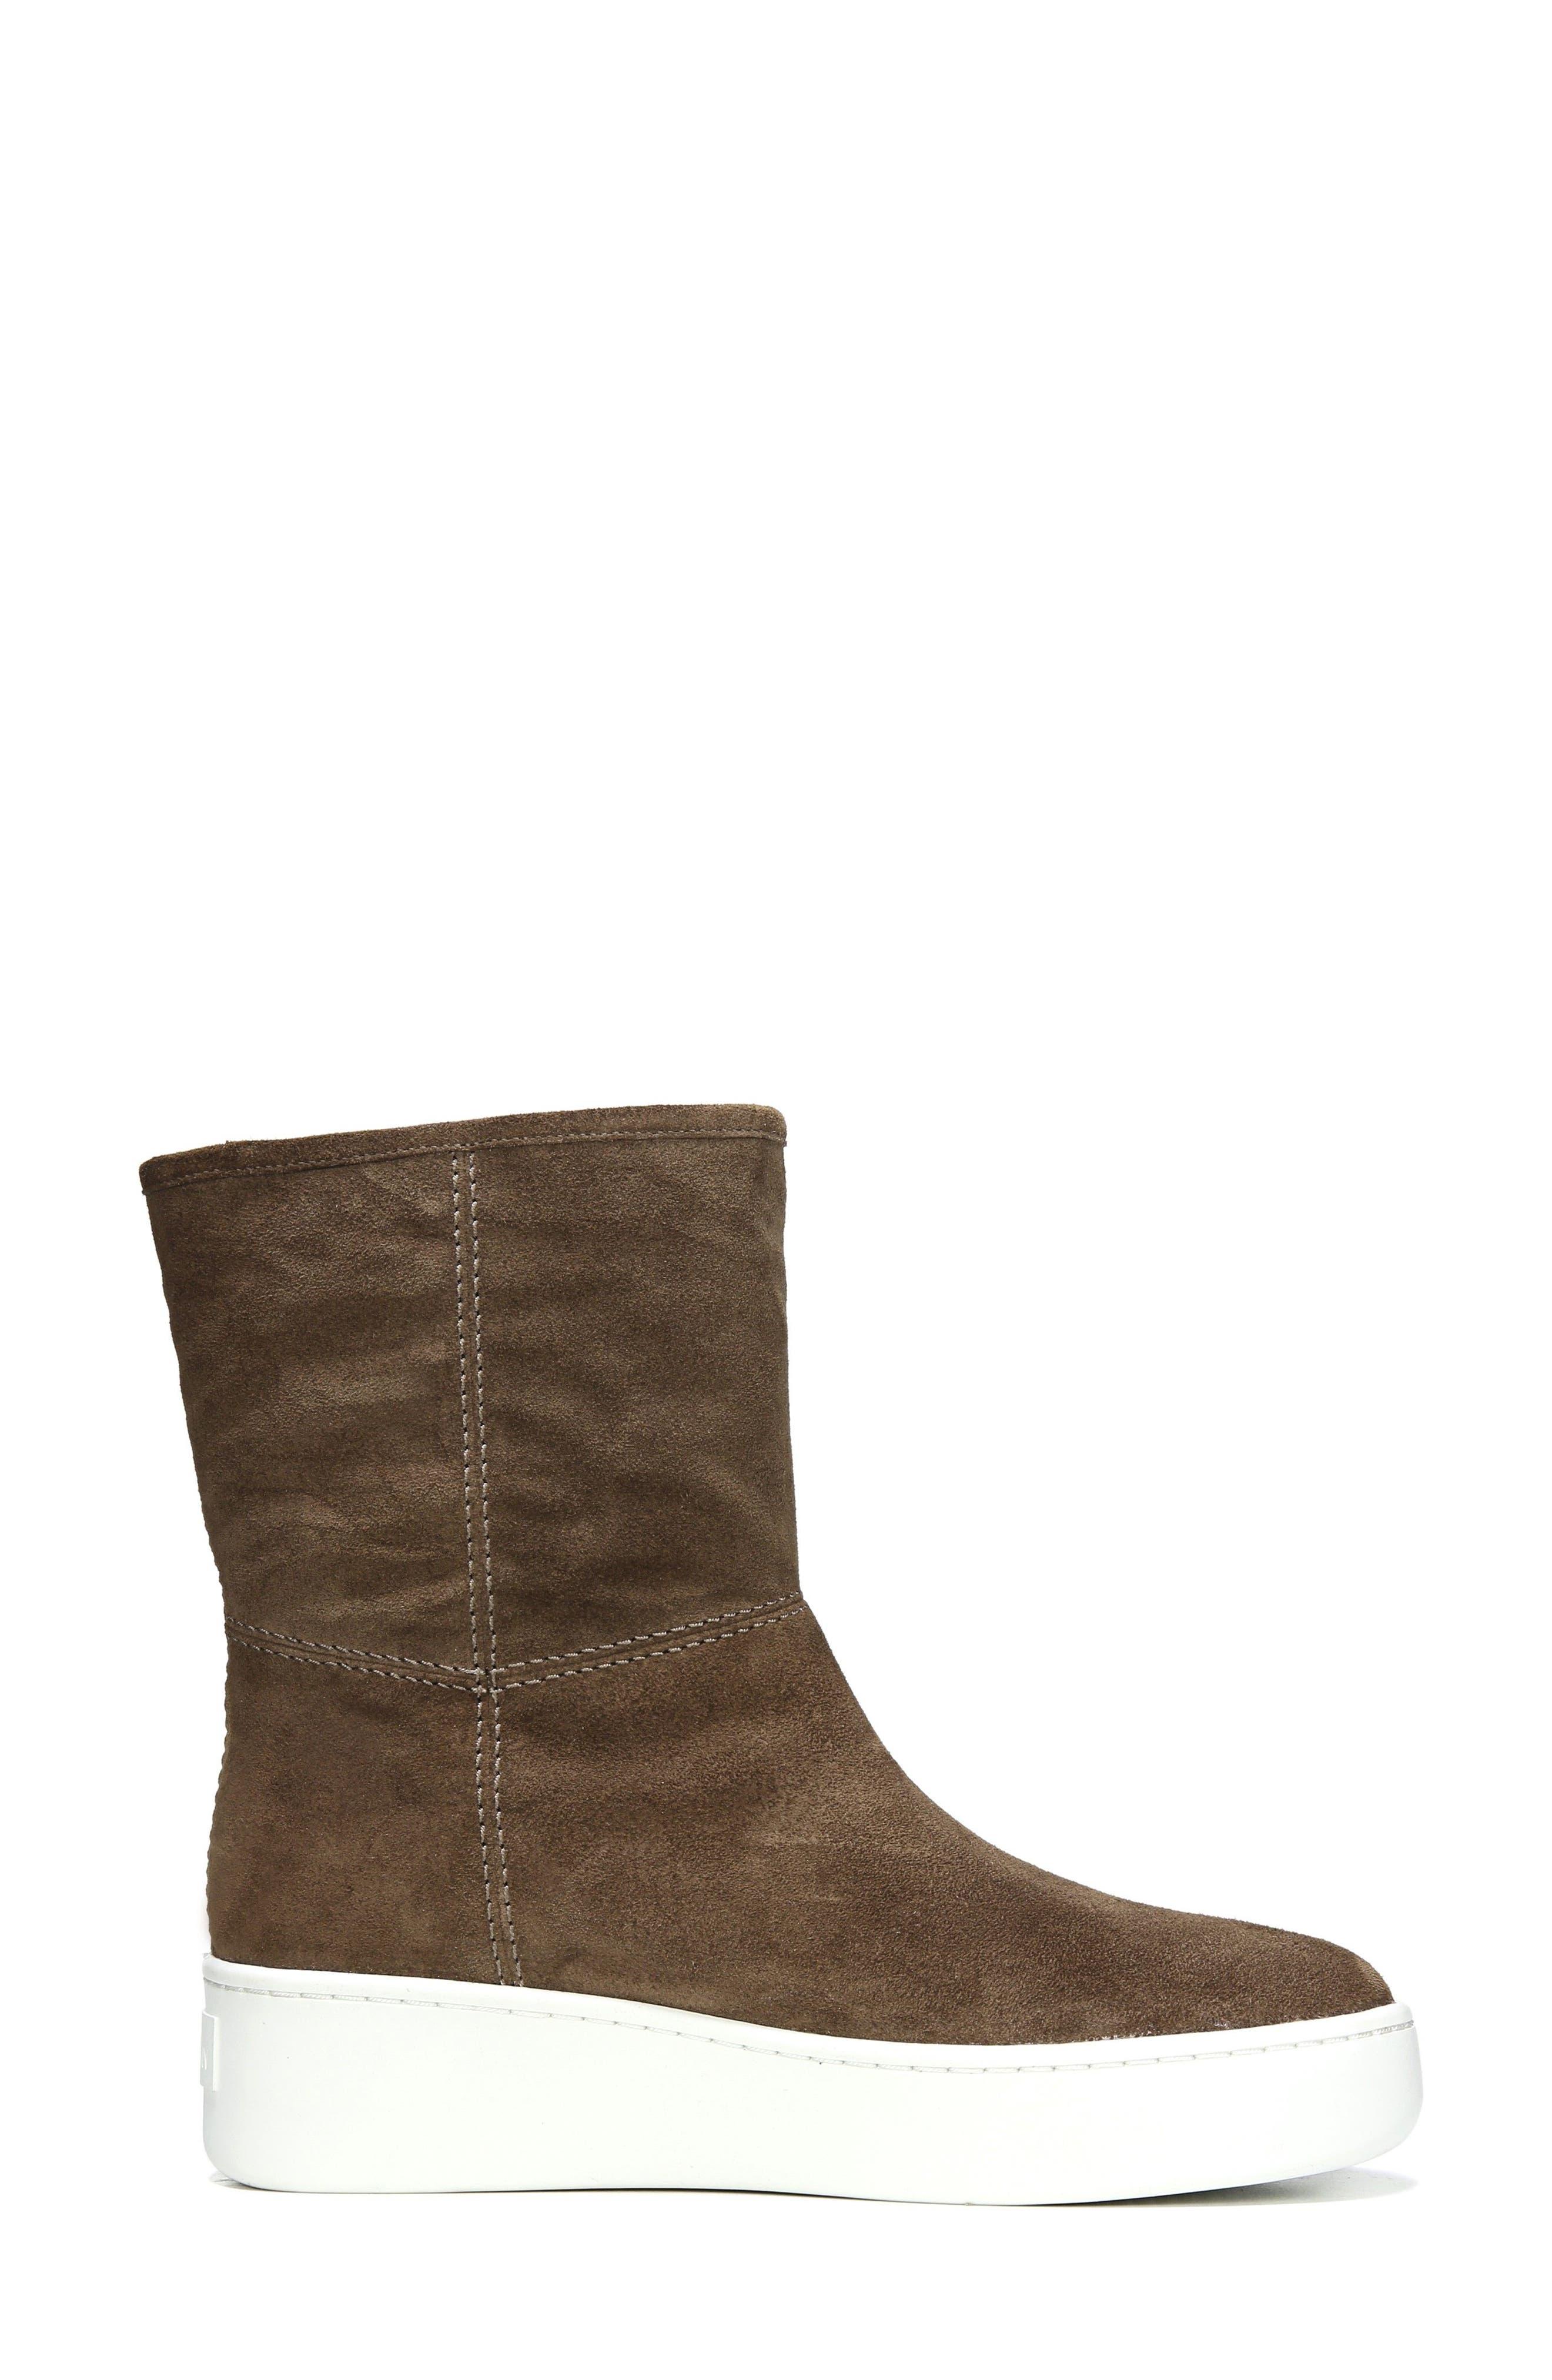 Elona Genuine Shearling Lined Sneaker Boot,                             Alternate thumbnail 3, color,                             Bark Suede